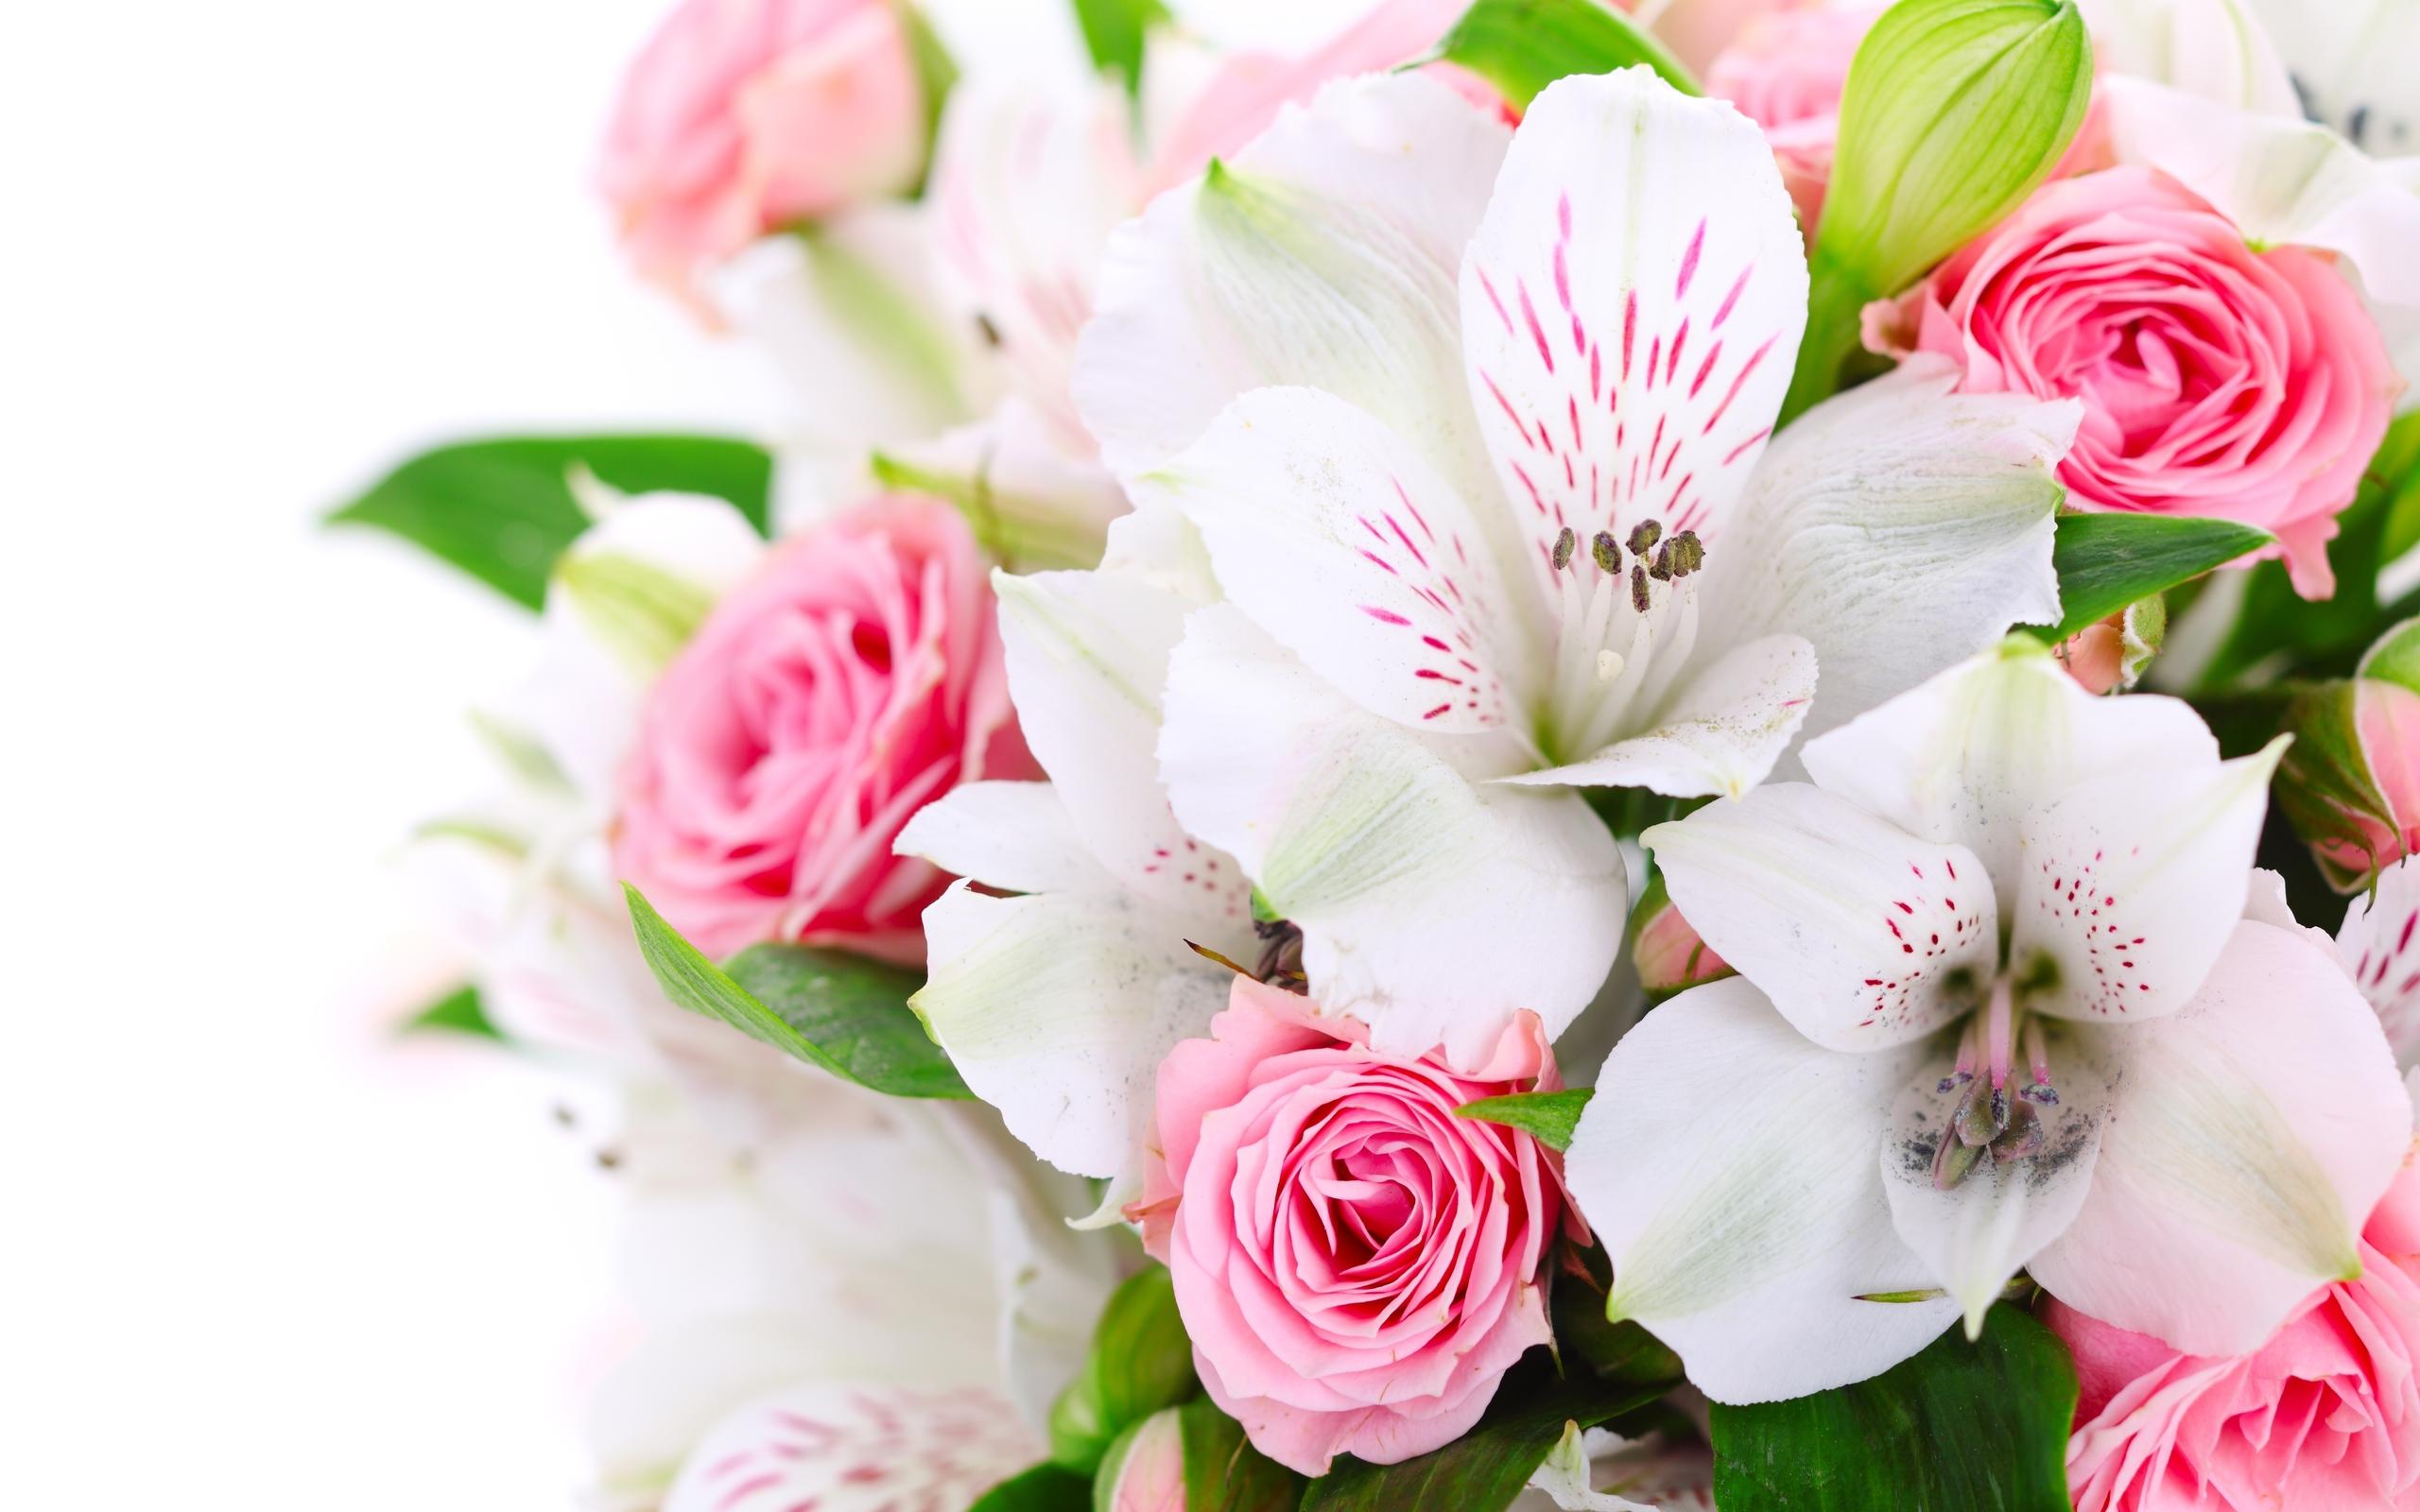 Pink flowers bouquet 27 free wallpaper hdflowerwallpaper pink flowers bouquet hd wallpaper mightylinksfo